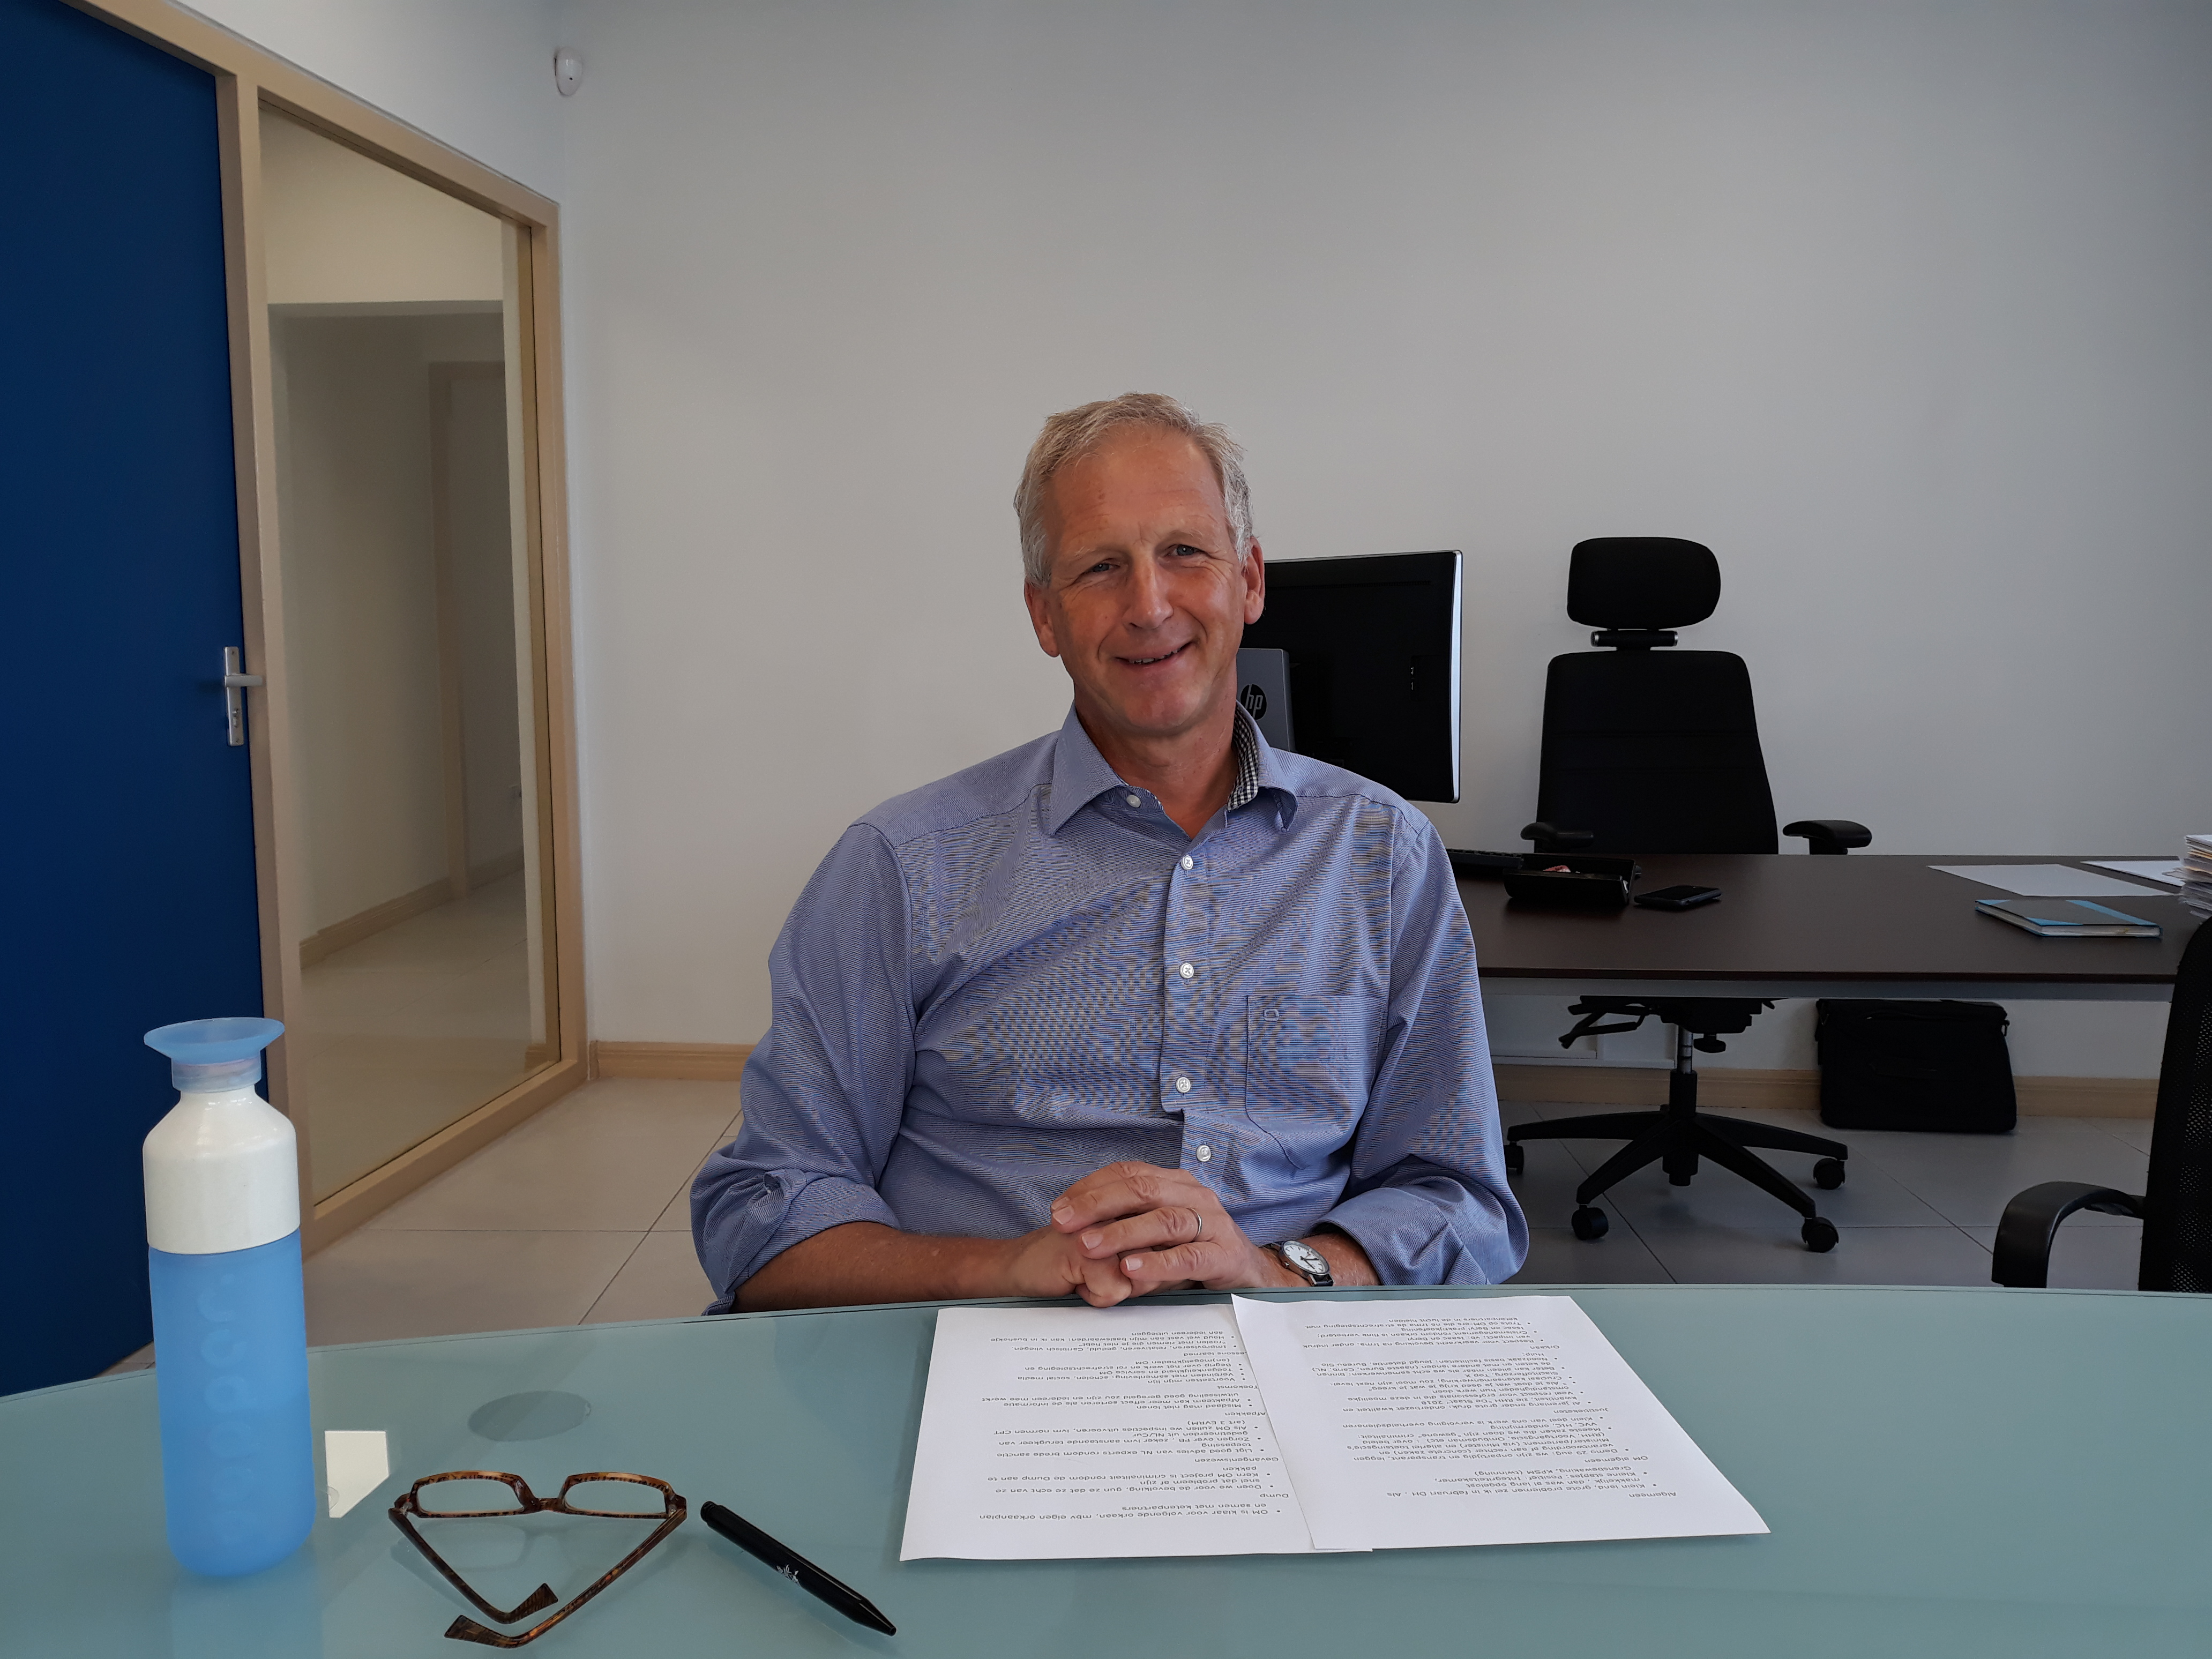 Chief Prosecutor Jeroen Steenbrink